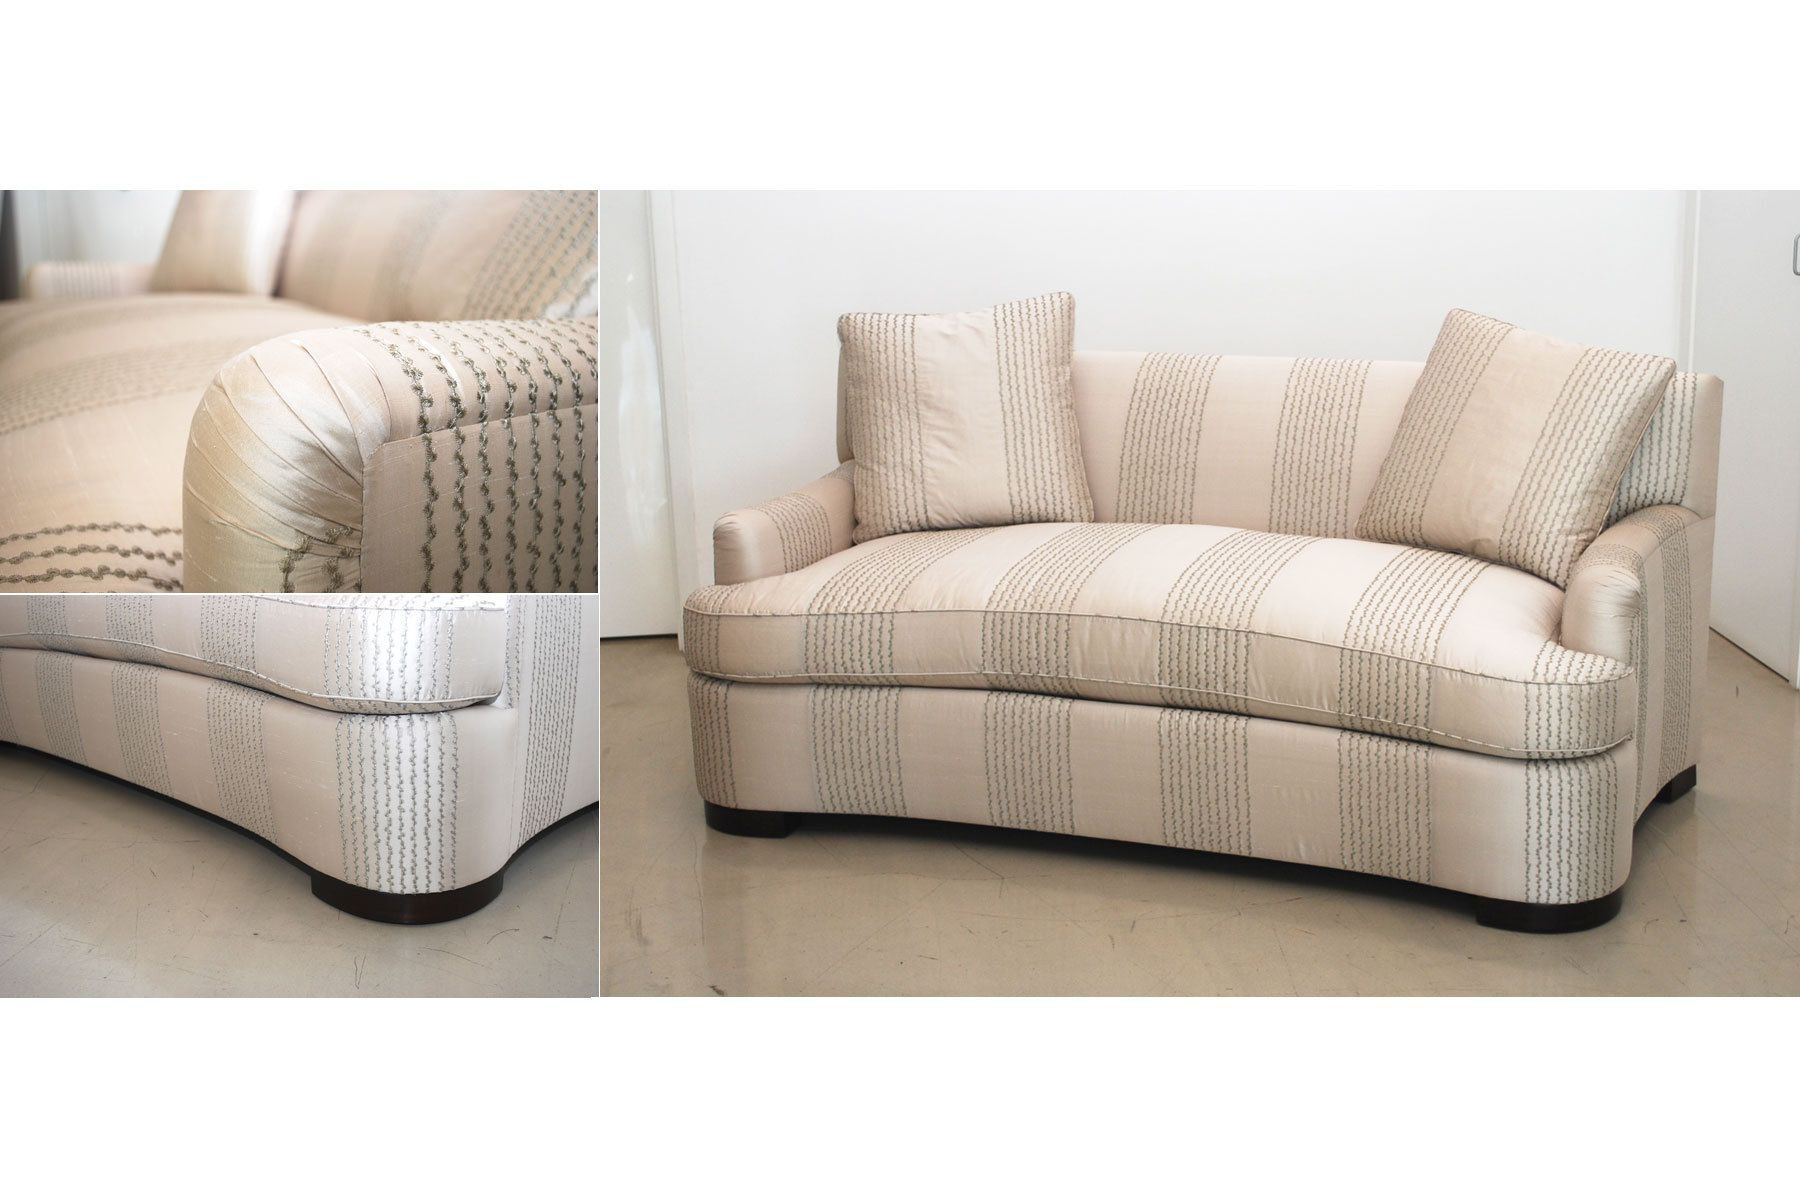 custom sectional sofa cama precio panama curved loveseat sofas